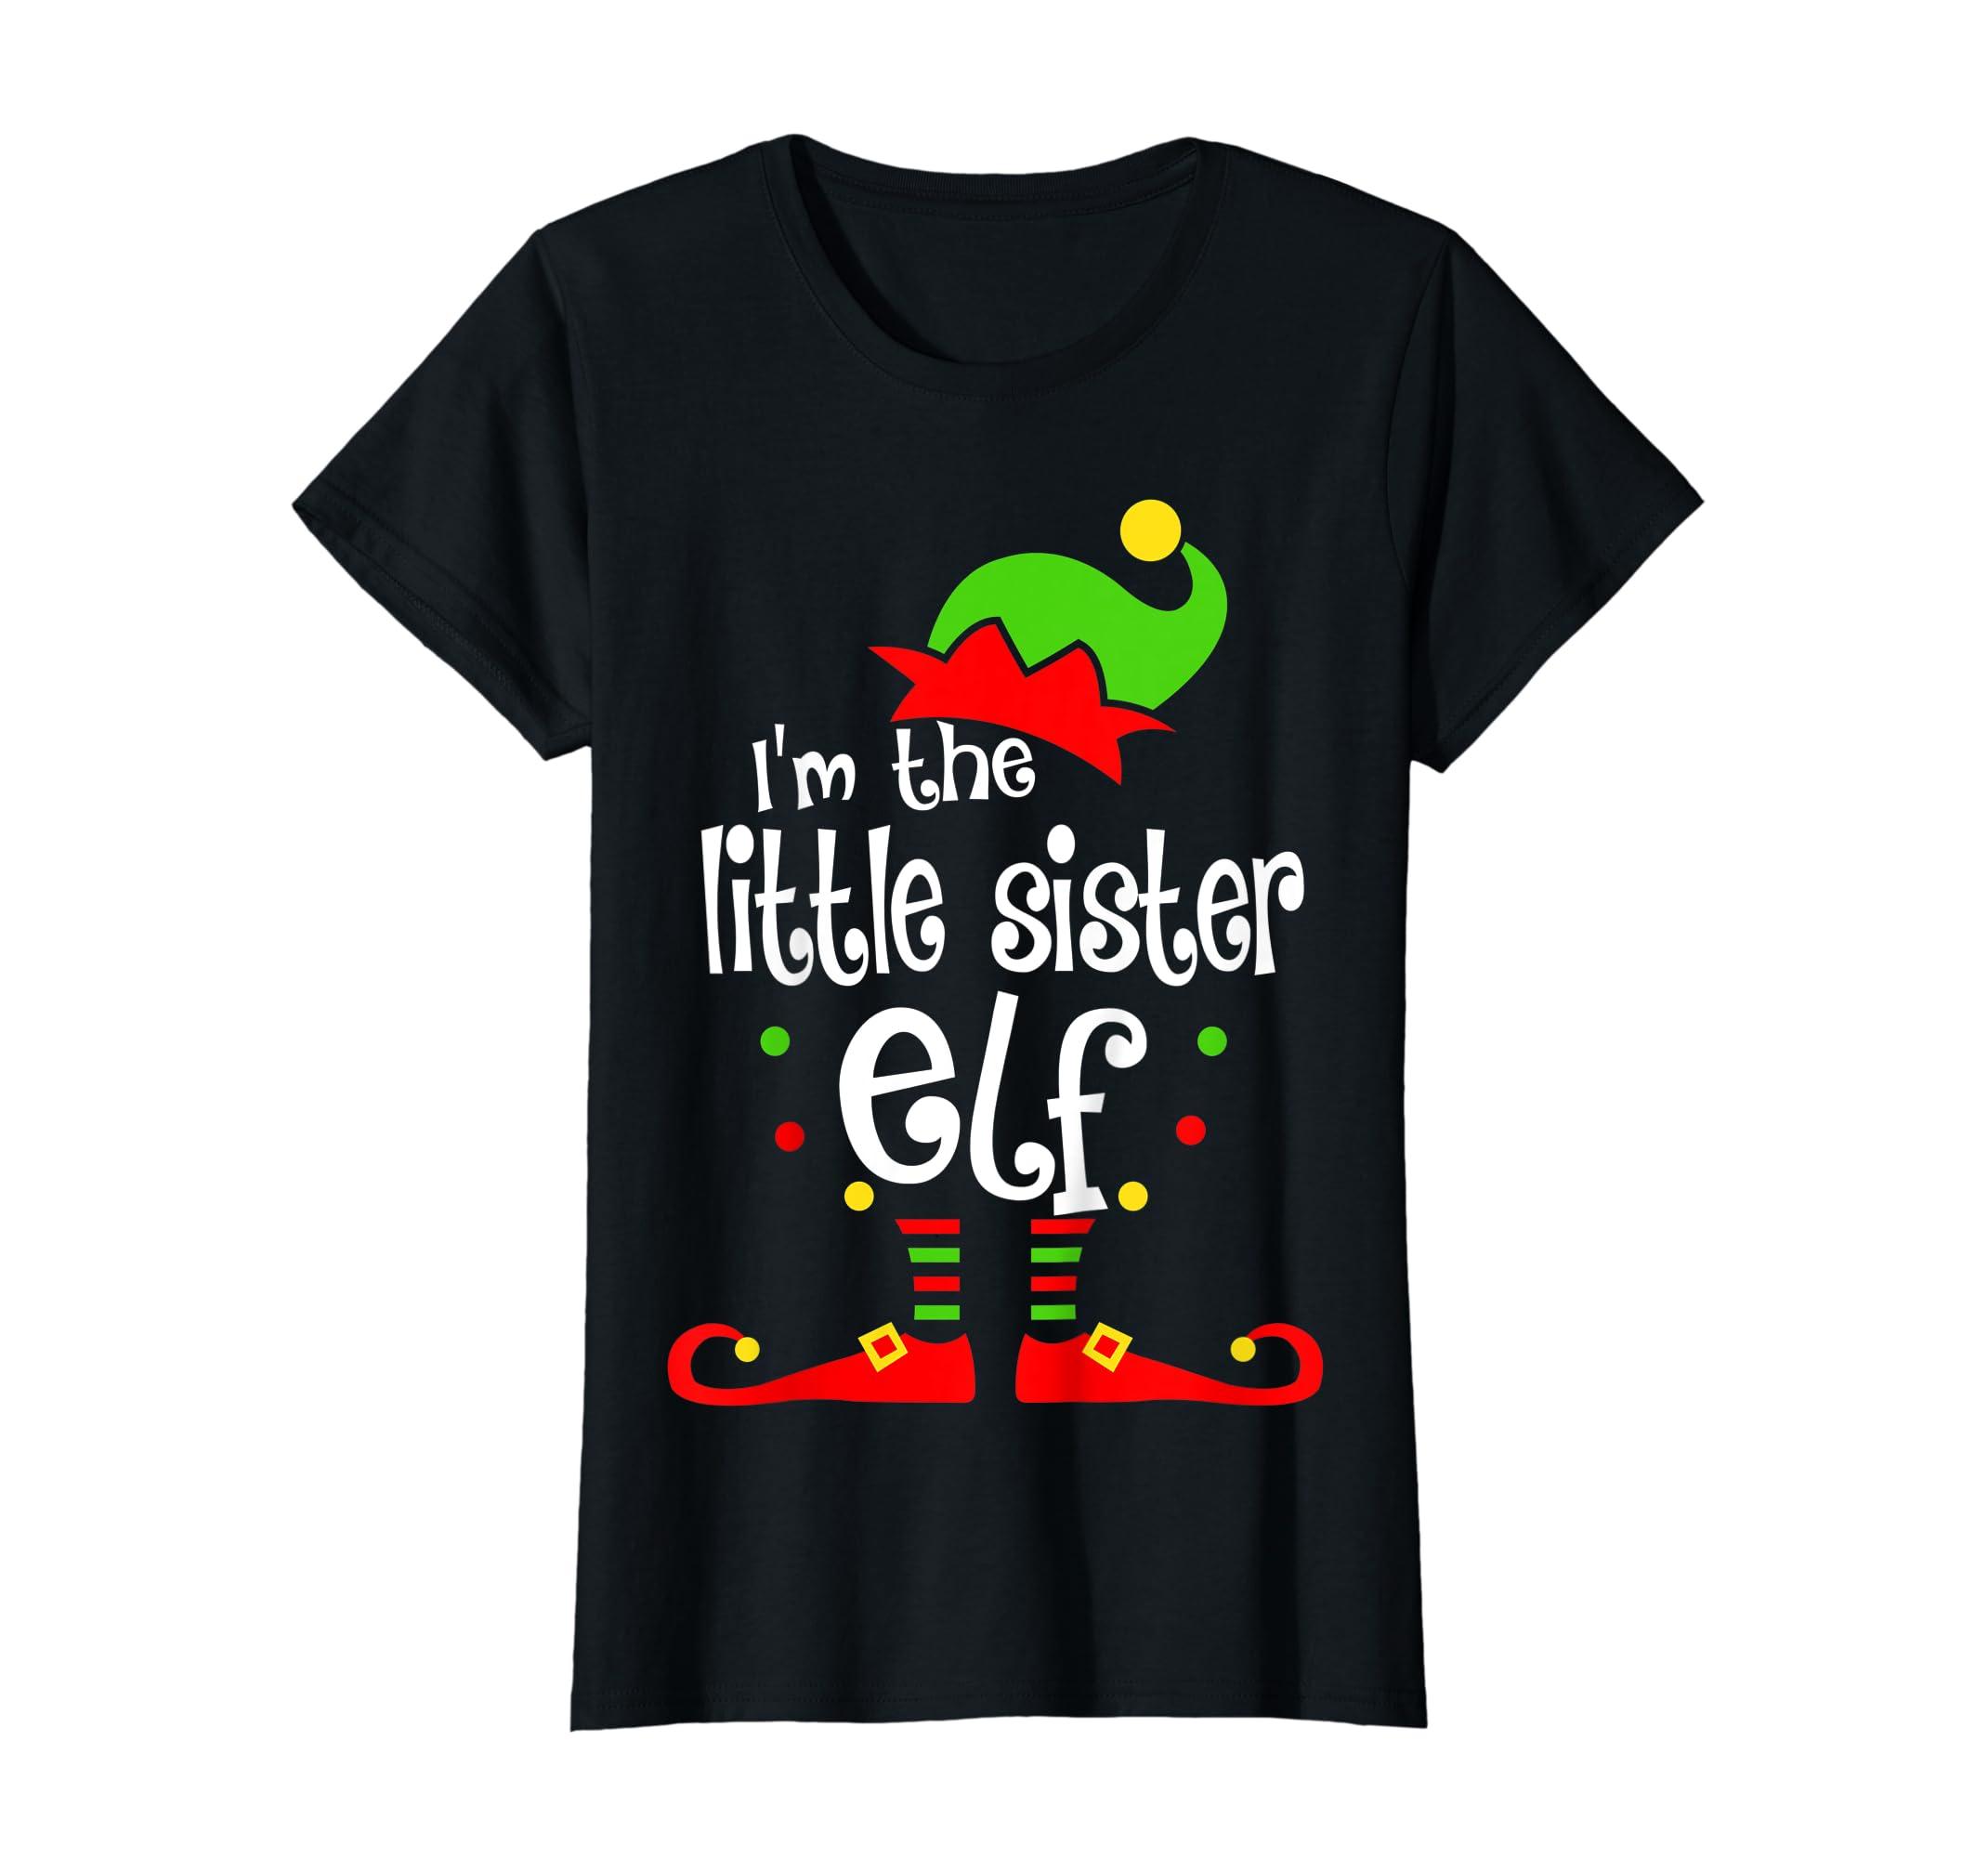 Kids Little Sister Elf Christmas Costume Outfit Xmas Gift T-Shirt-Women's T-Shirt-Black